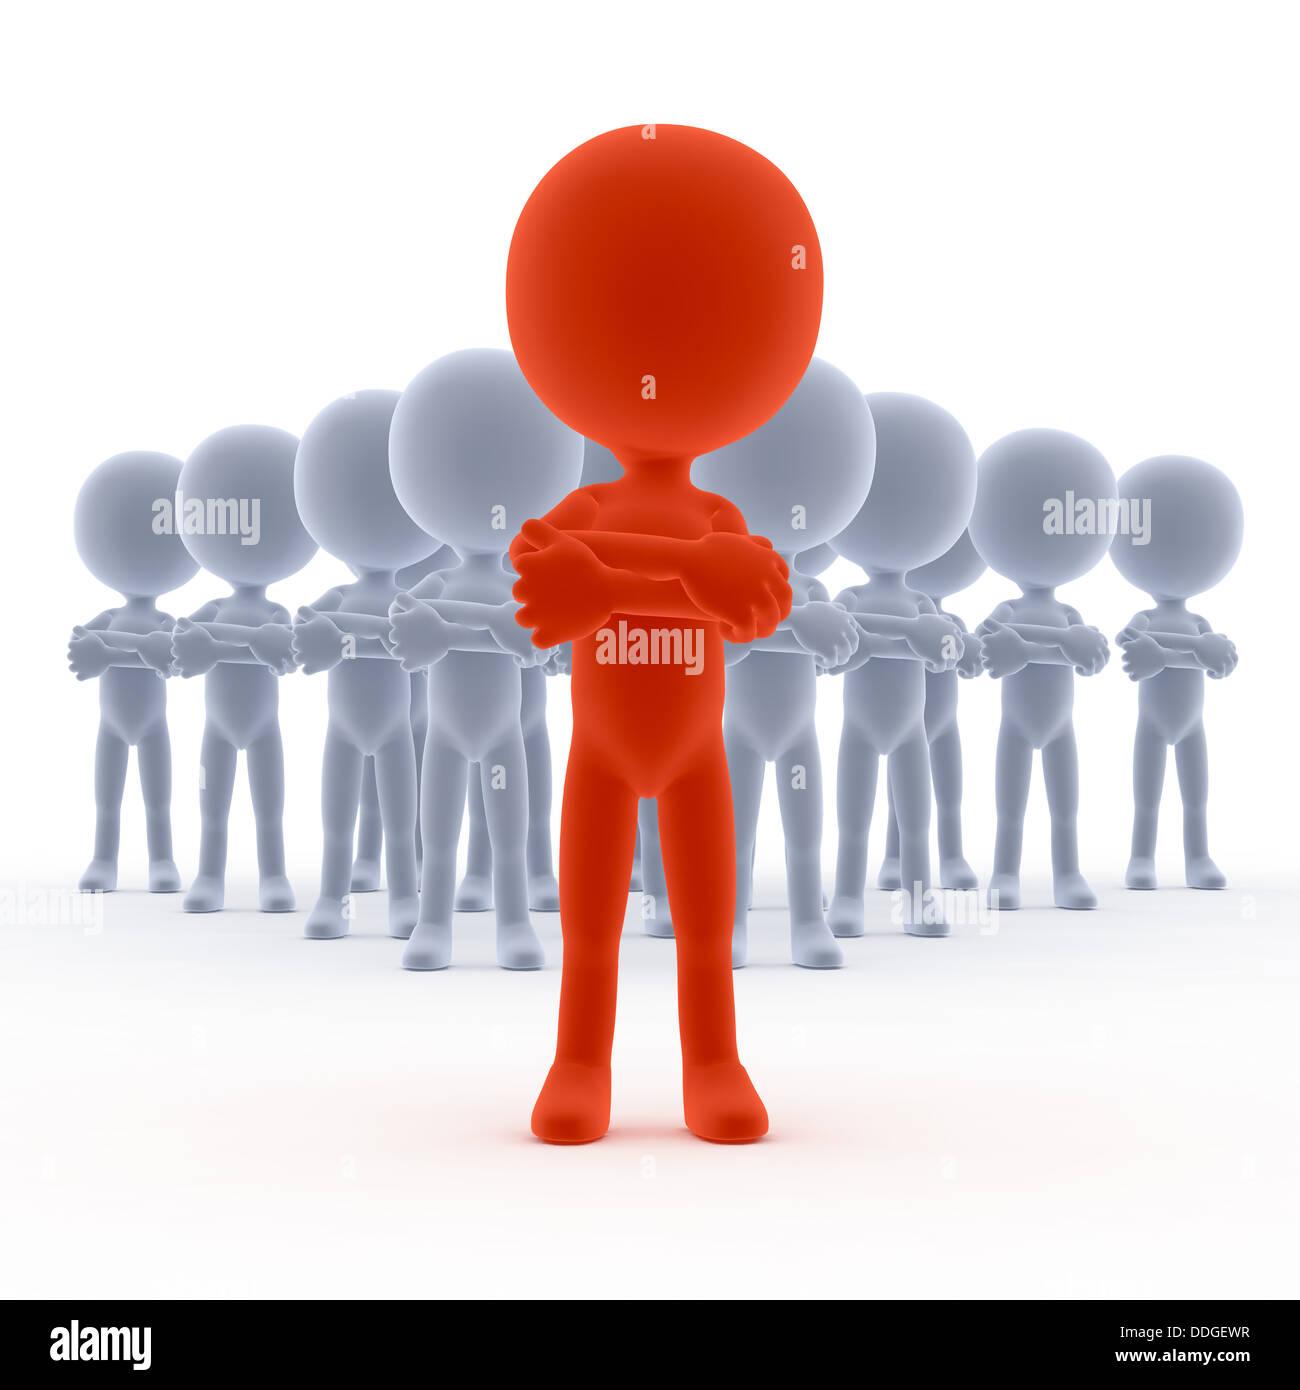 Leadership Team Leader Concept Stock Photo